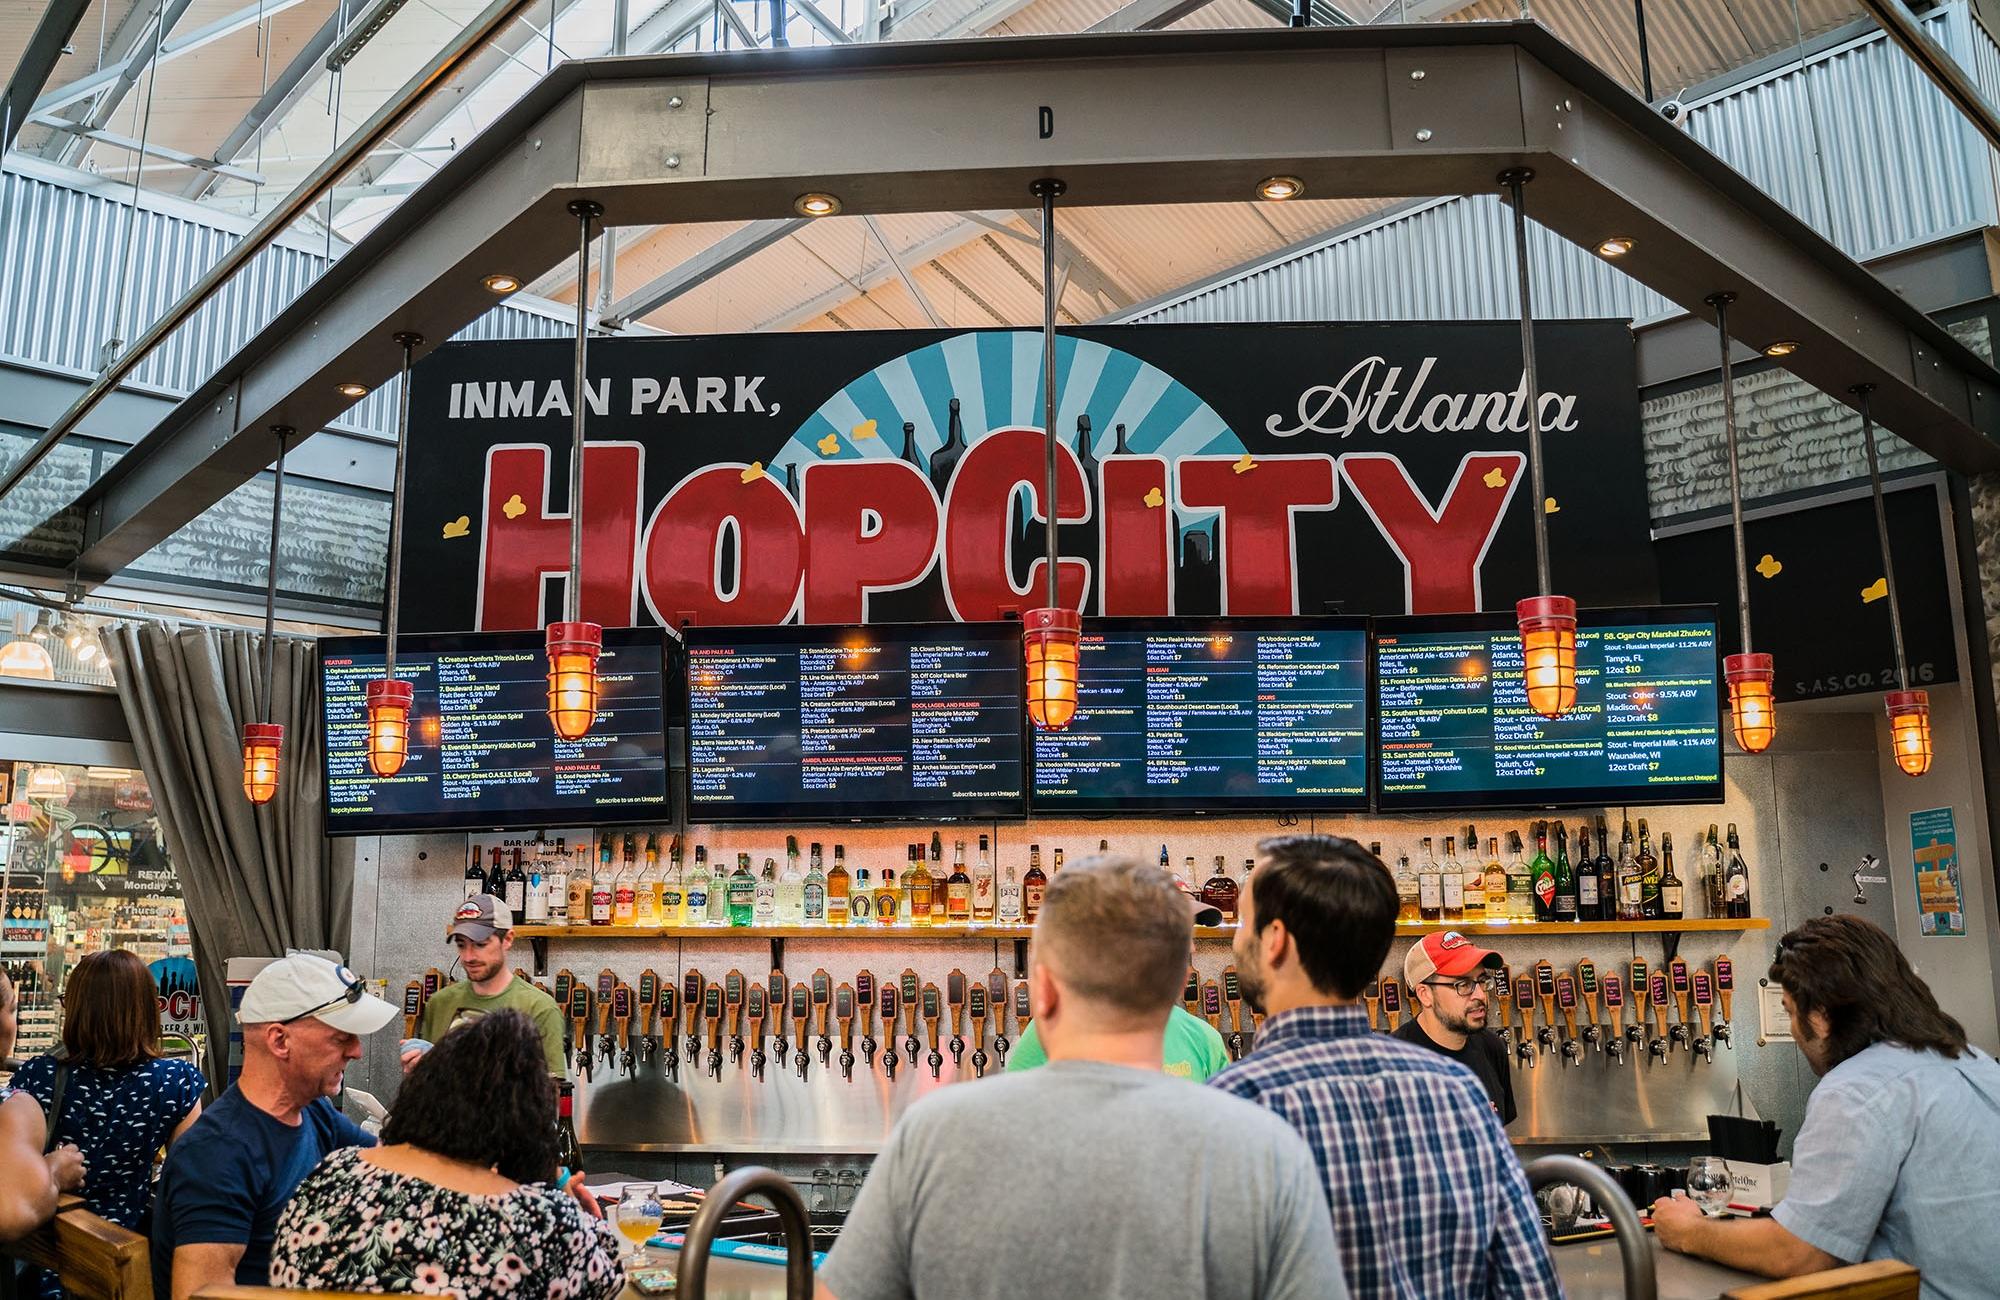 Hop City Inman Park - Atlanta Georgia